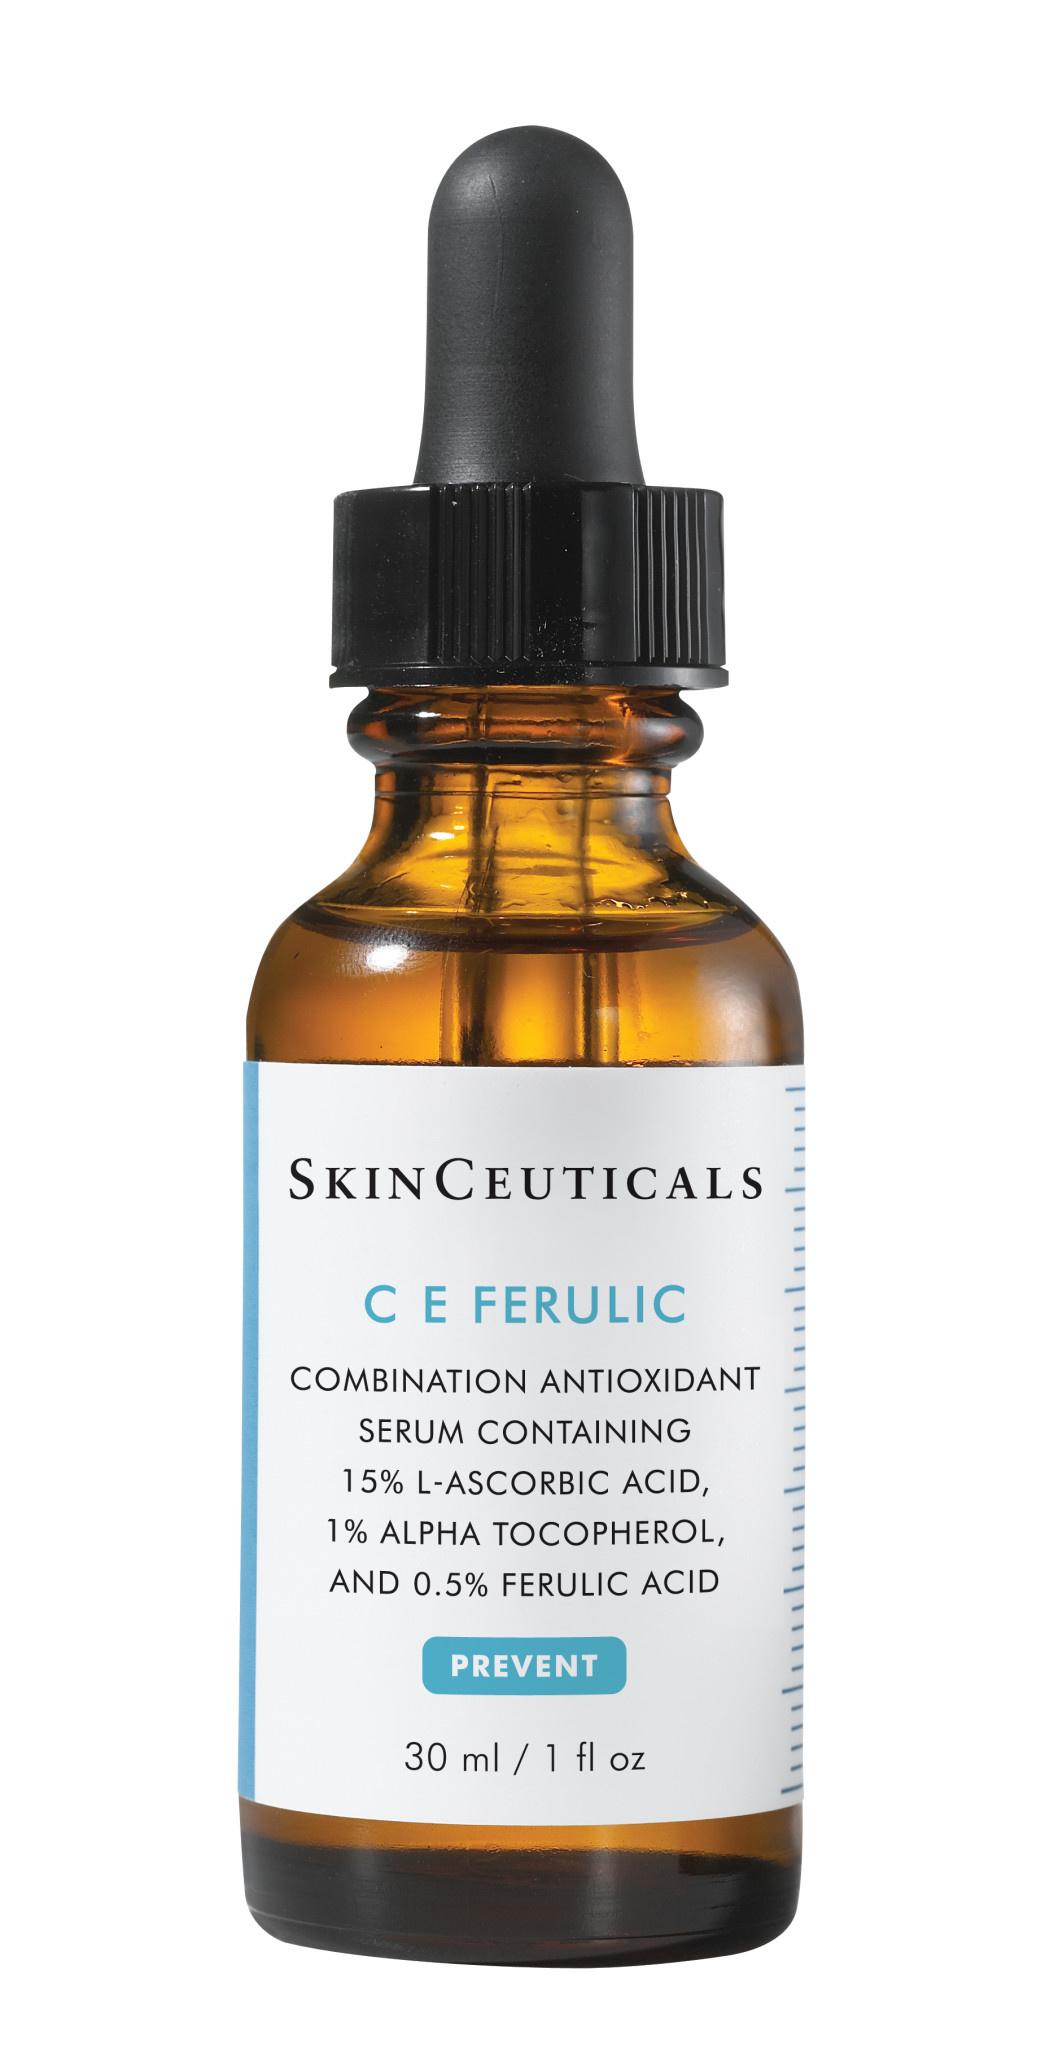 CE Ferulic 30ml-1